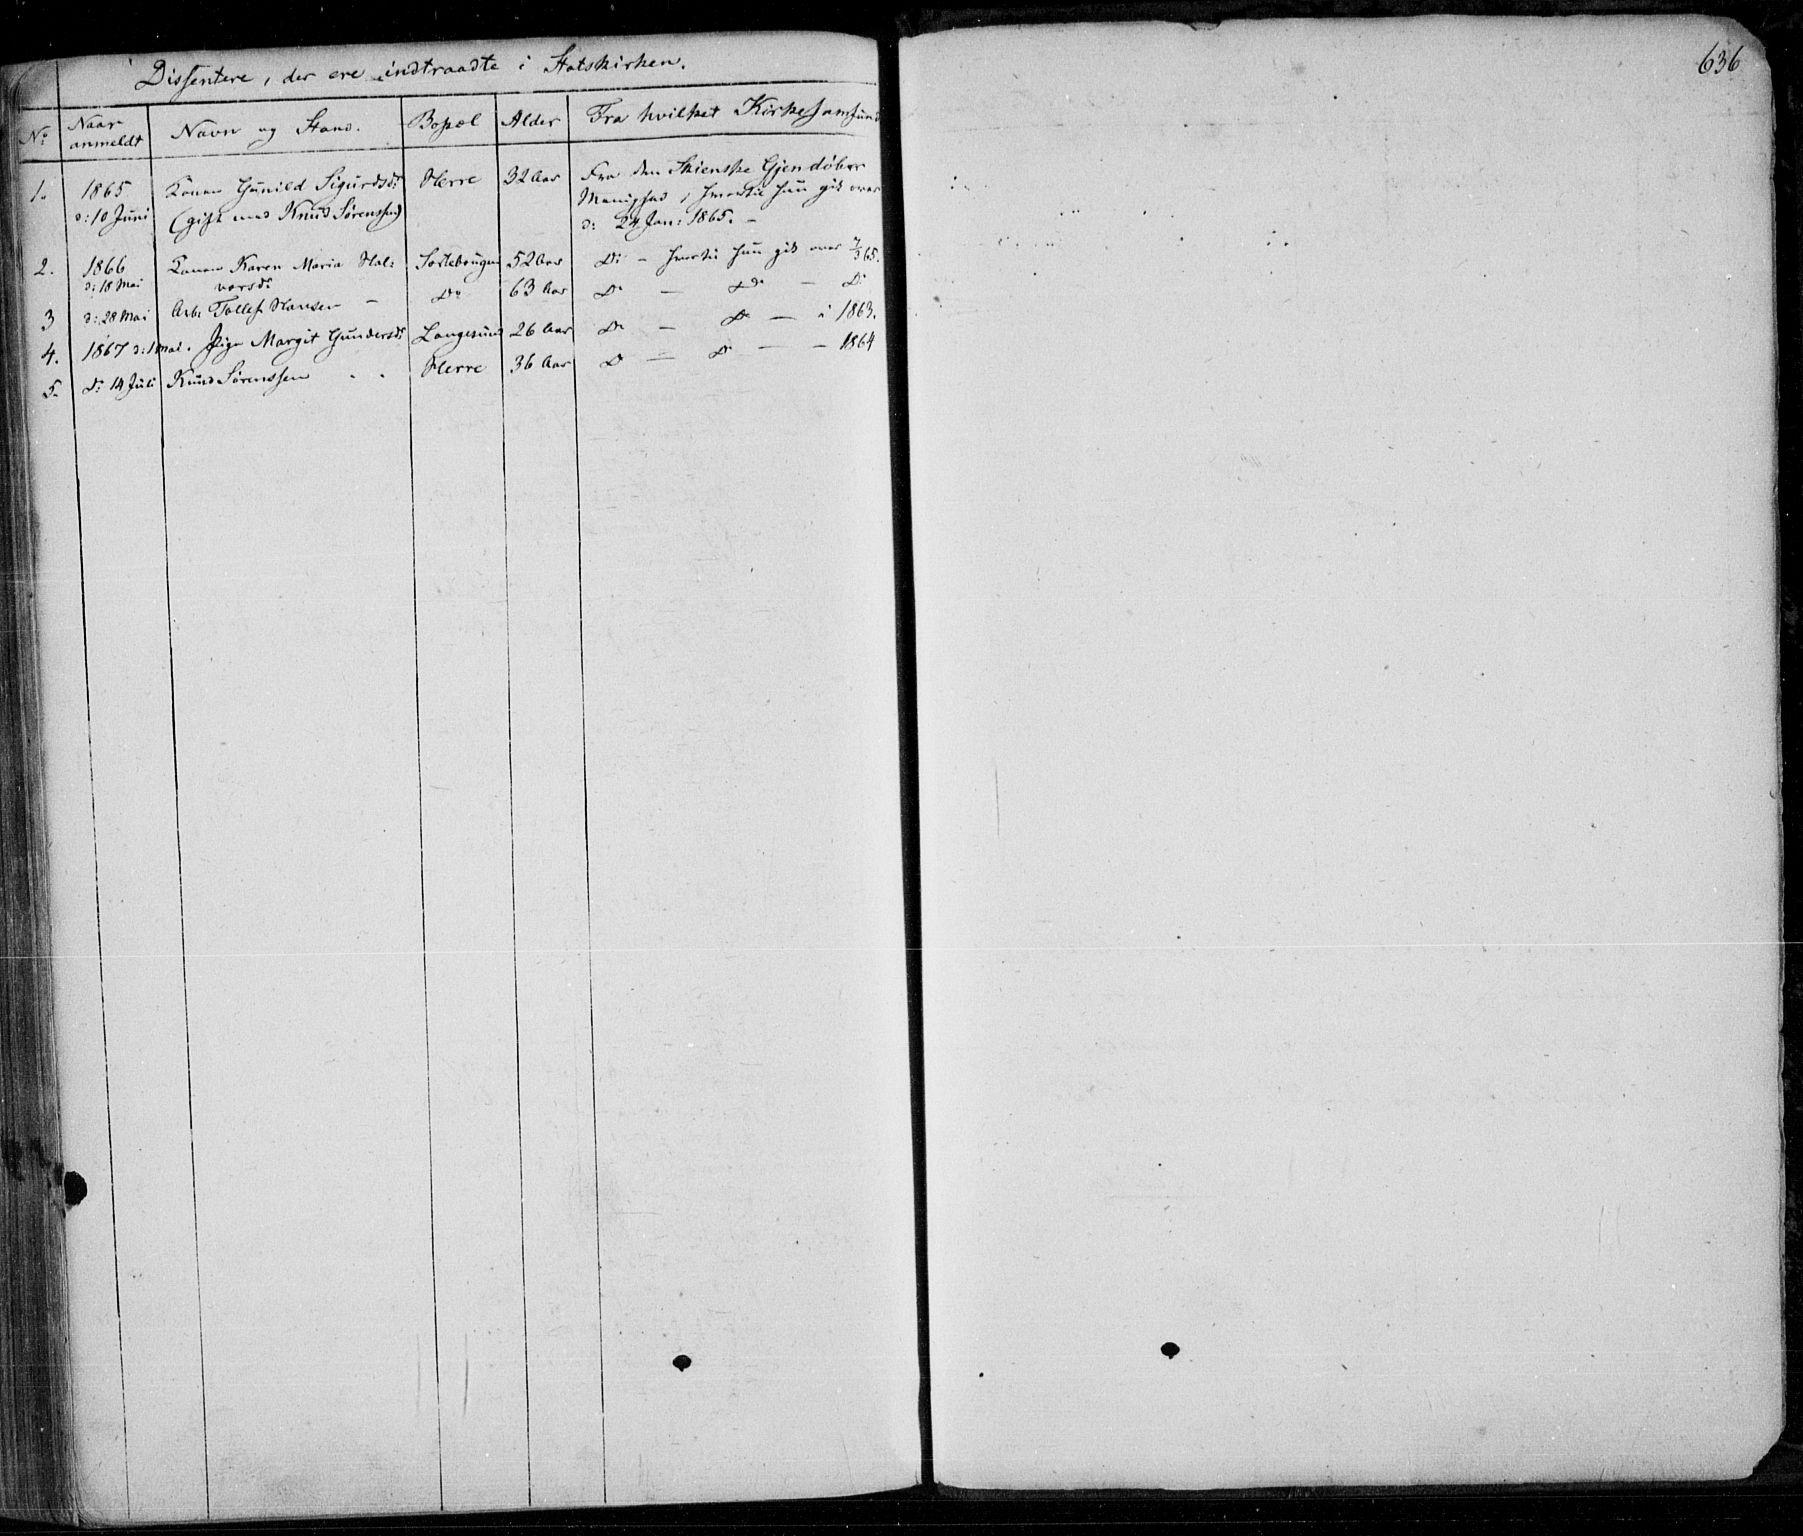 SAKO, Bamble kirkebøker, F/Fa/L0005: Ministerialbok nr. I 5, 1854-1869, s. 636